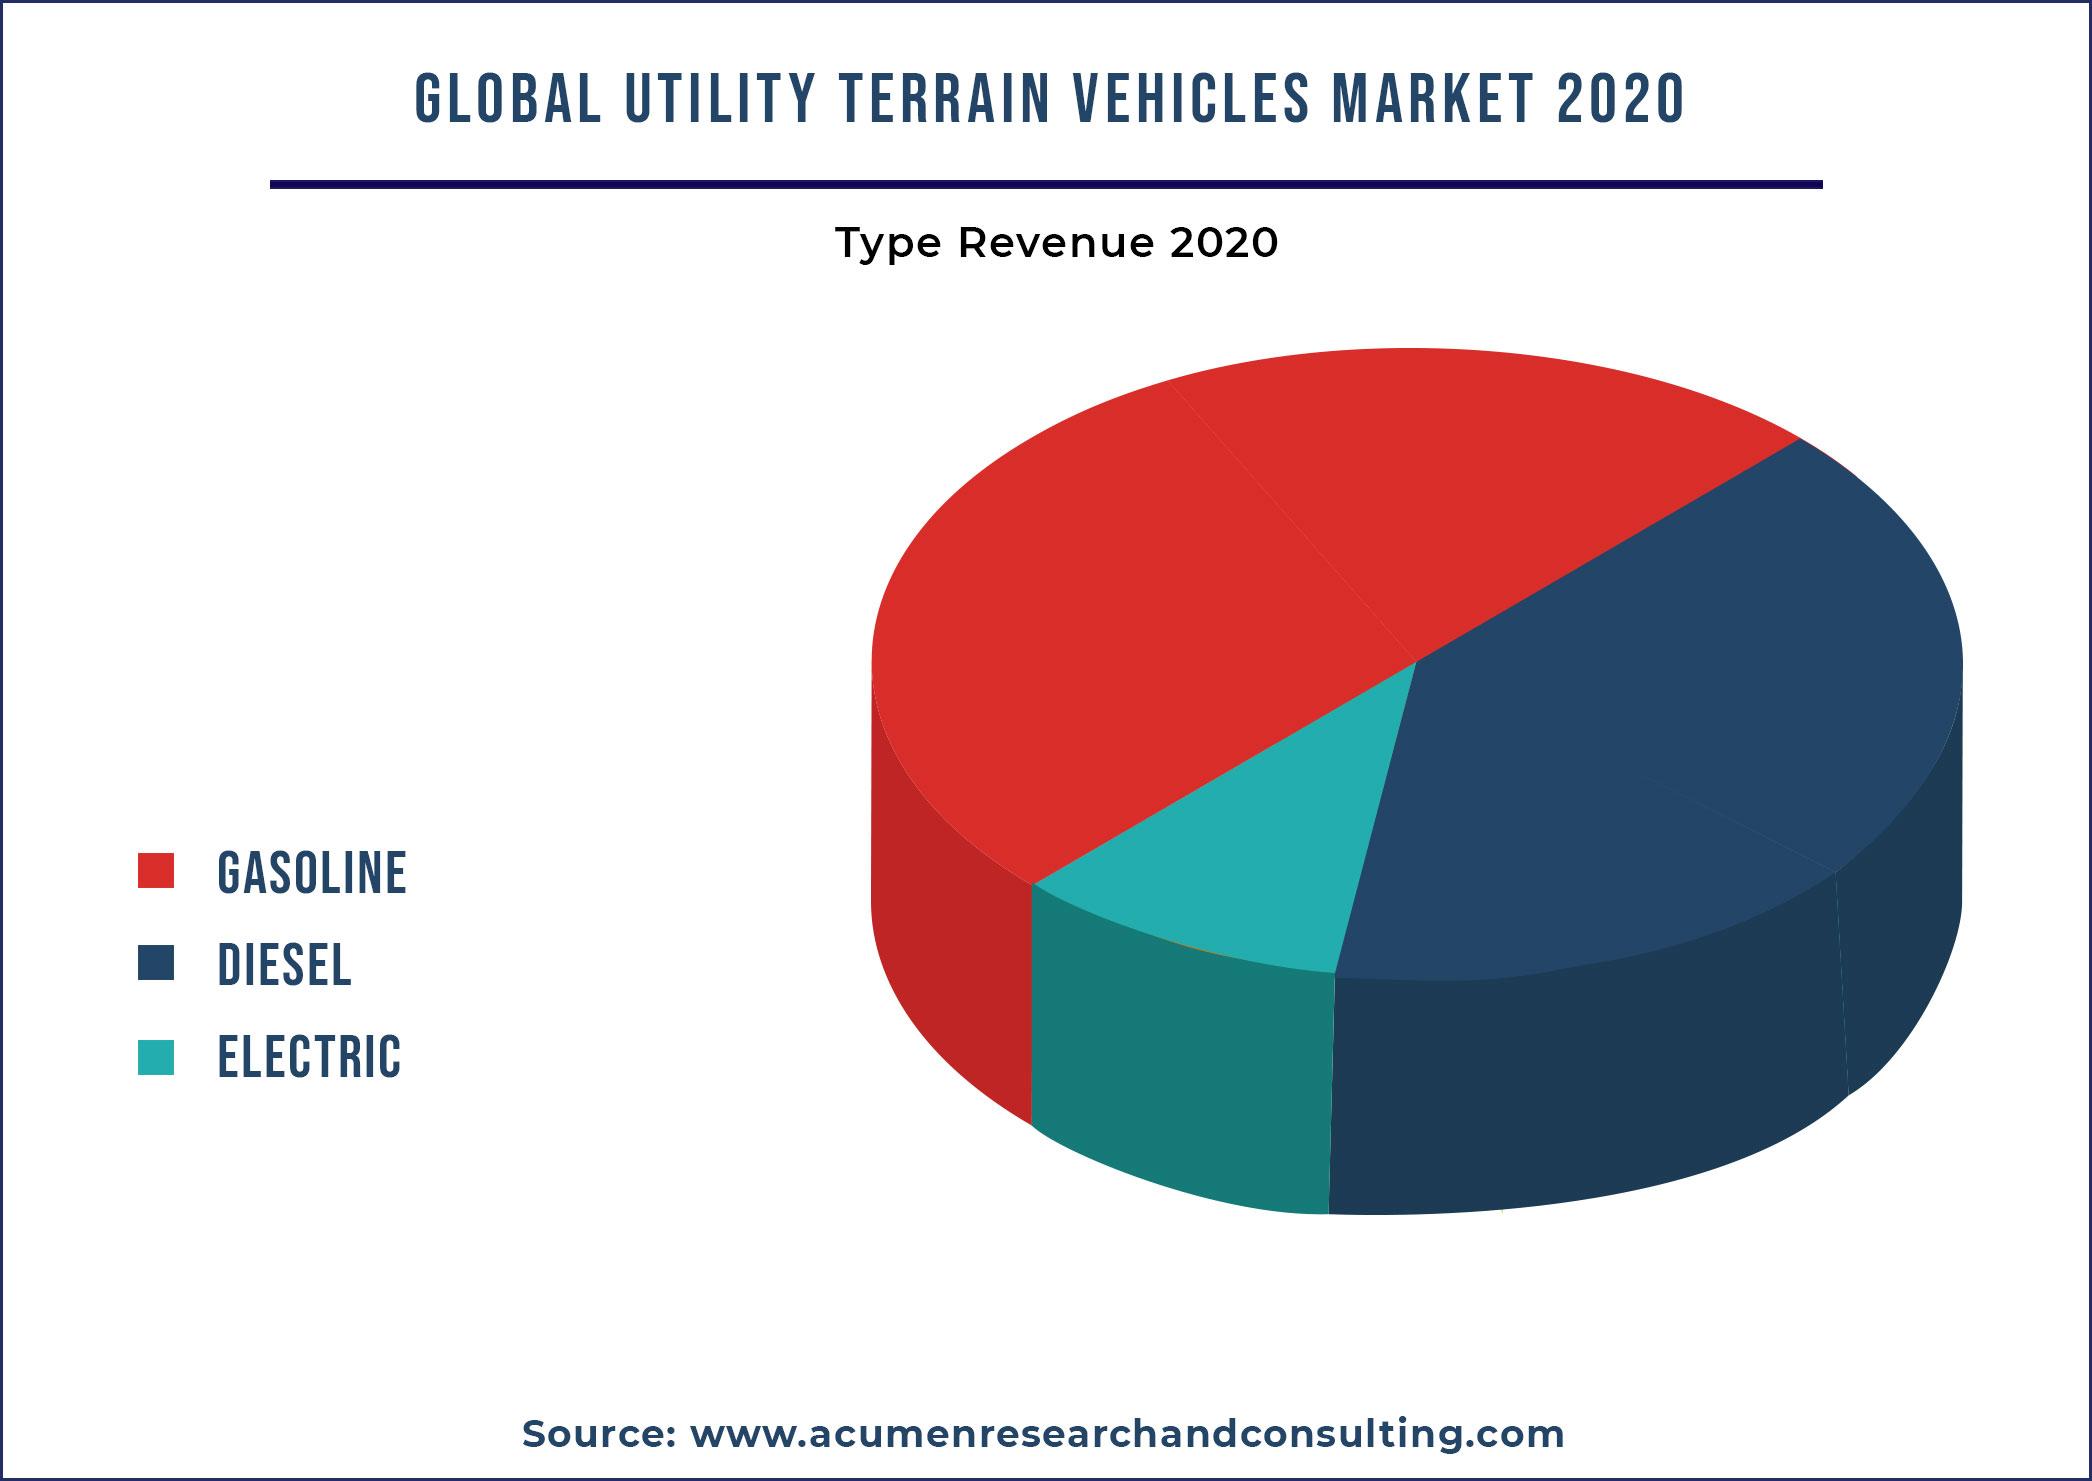 Utility Terrain Vehicles (UTV) Market By Propulsion Type 2021-2028